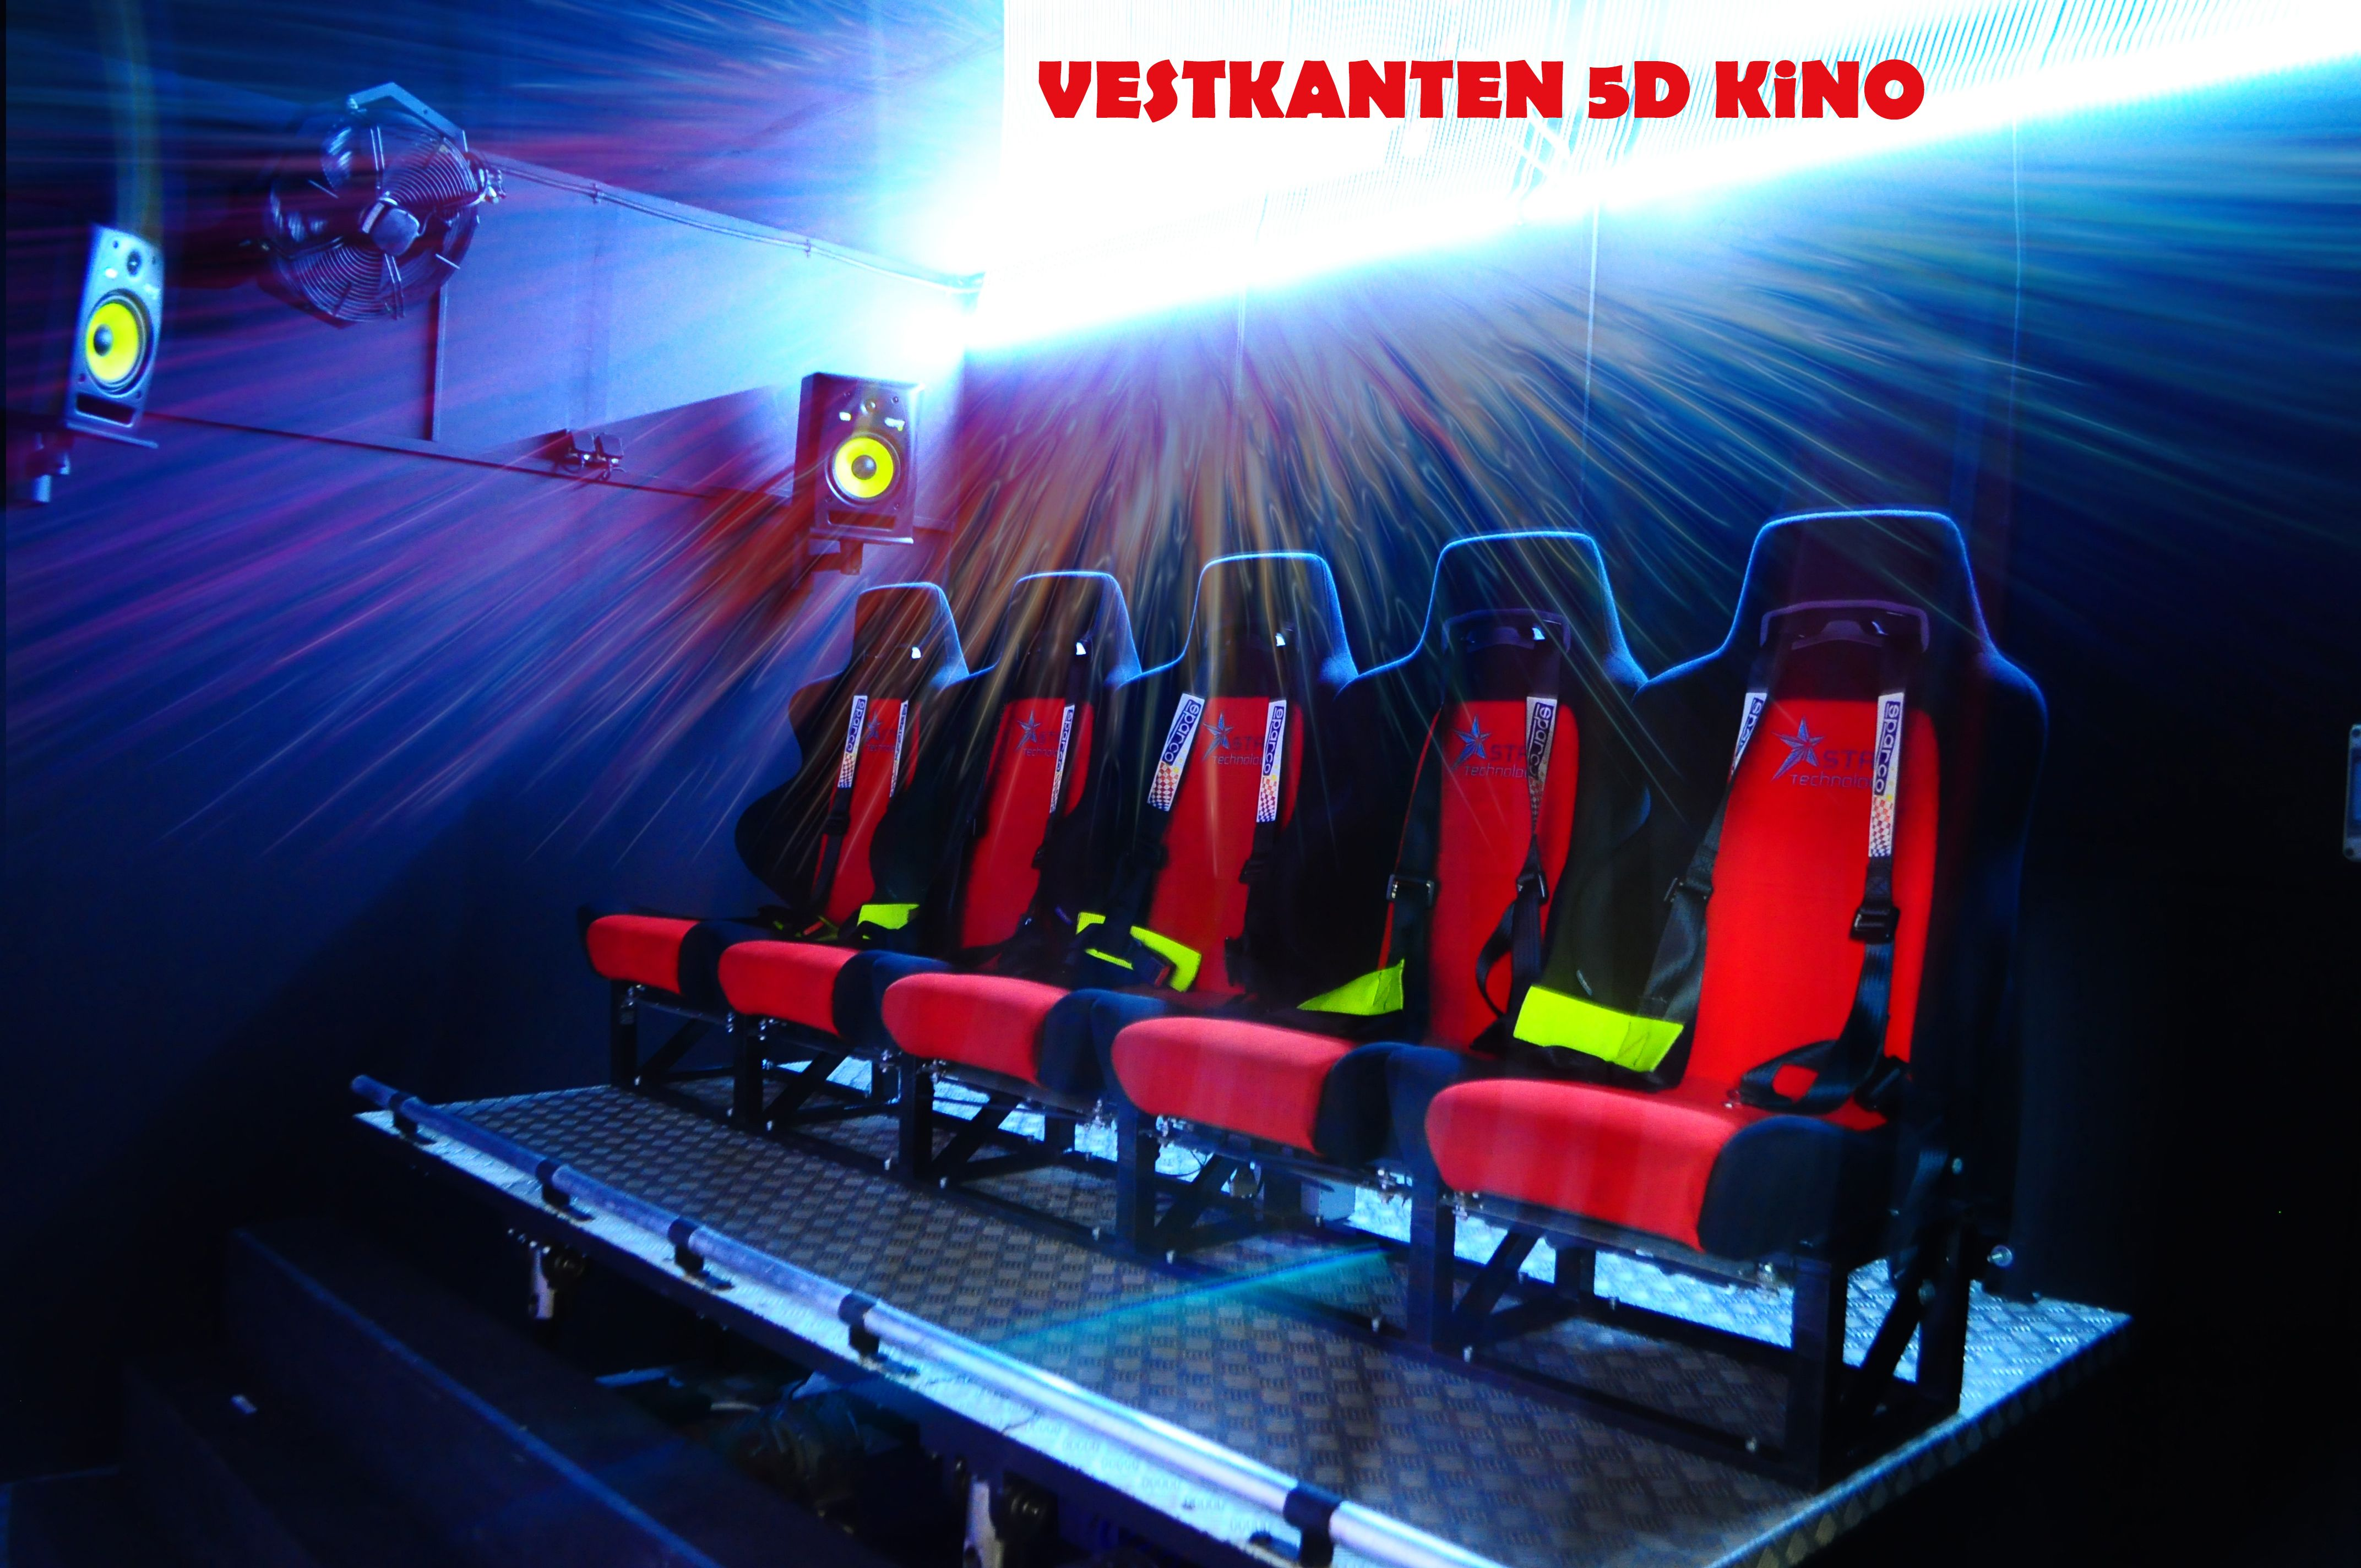 bbfb51bee 5d kino 4d kino bergen mc donalds bergen loddefjord askøy sotra kino 3d  aktivitet for barn